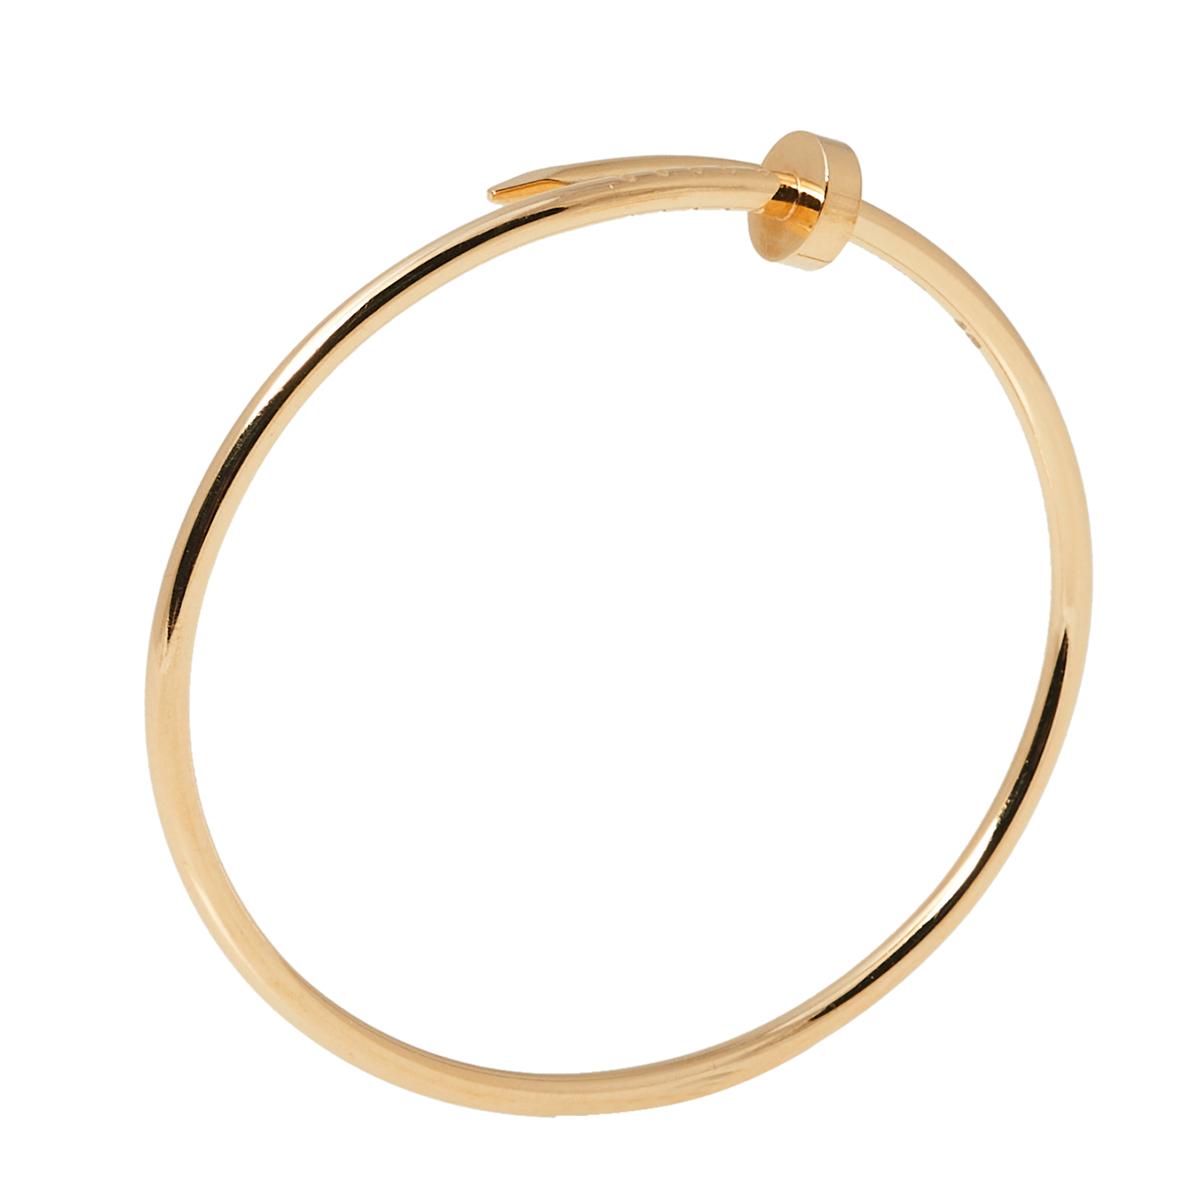 Cartier Juste Un Clou 18K Yellow Gold Narrow SM Bracelet 17